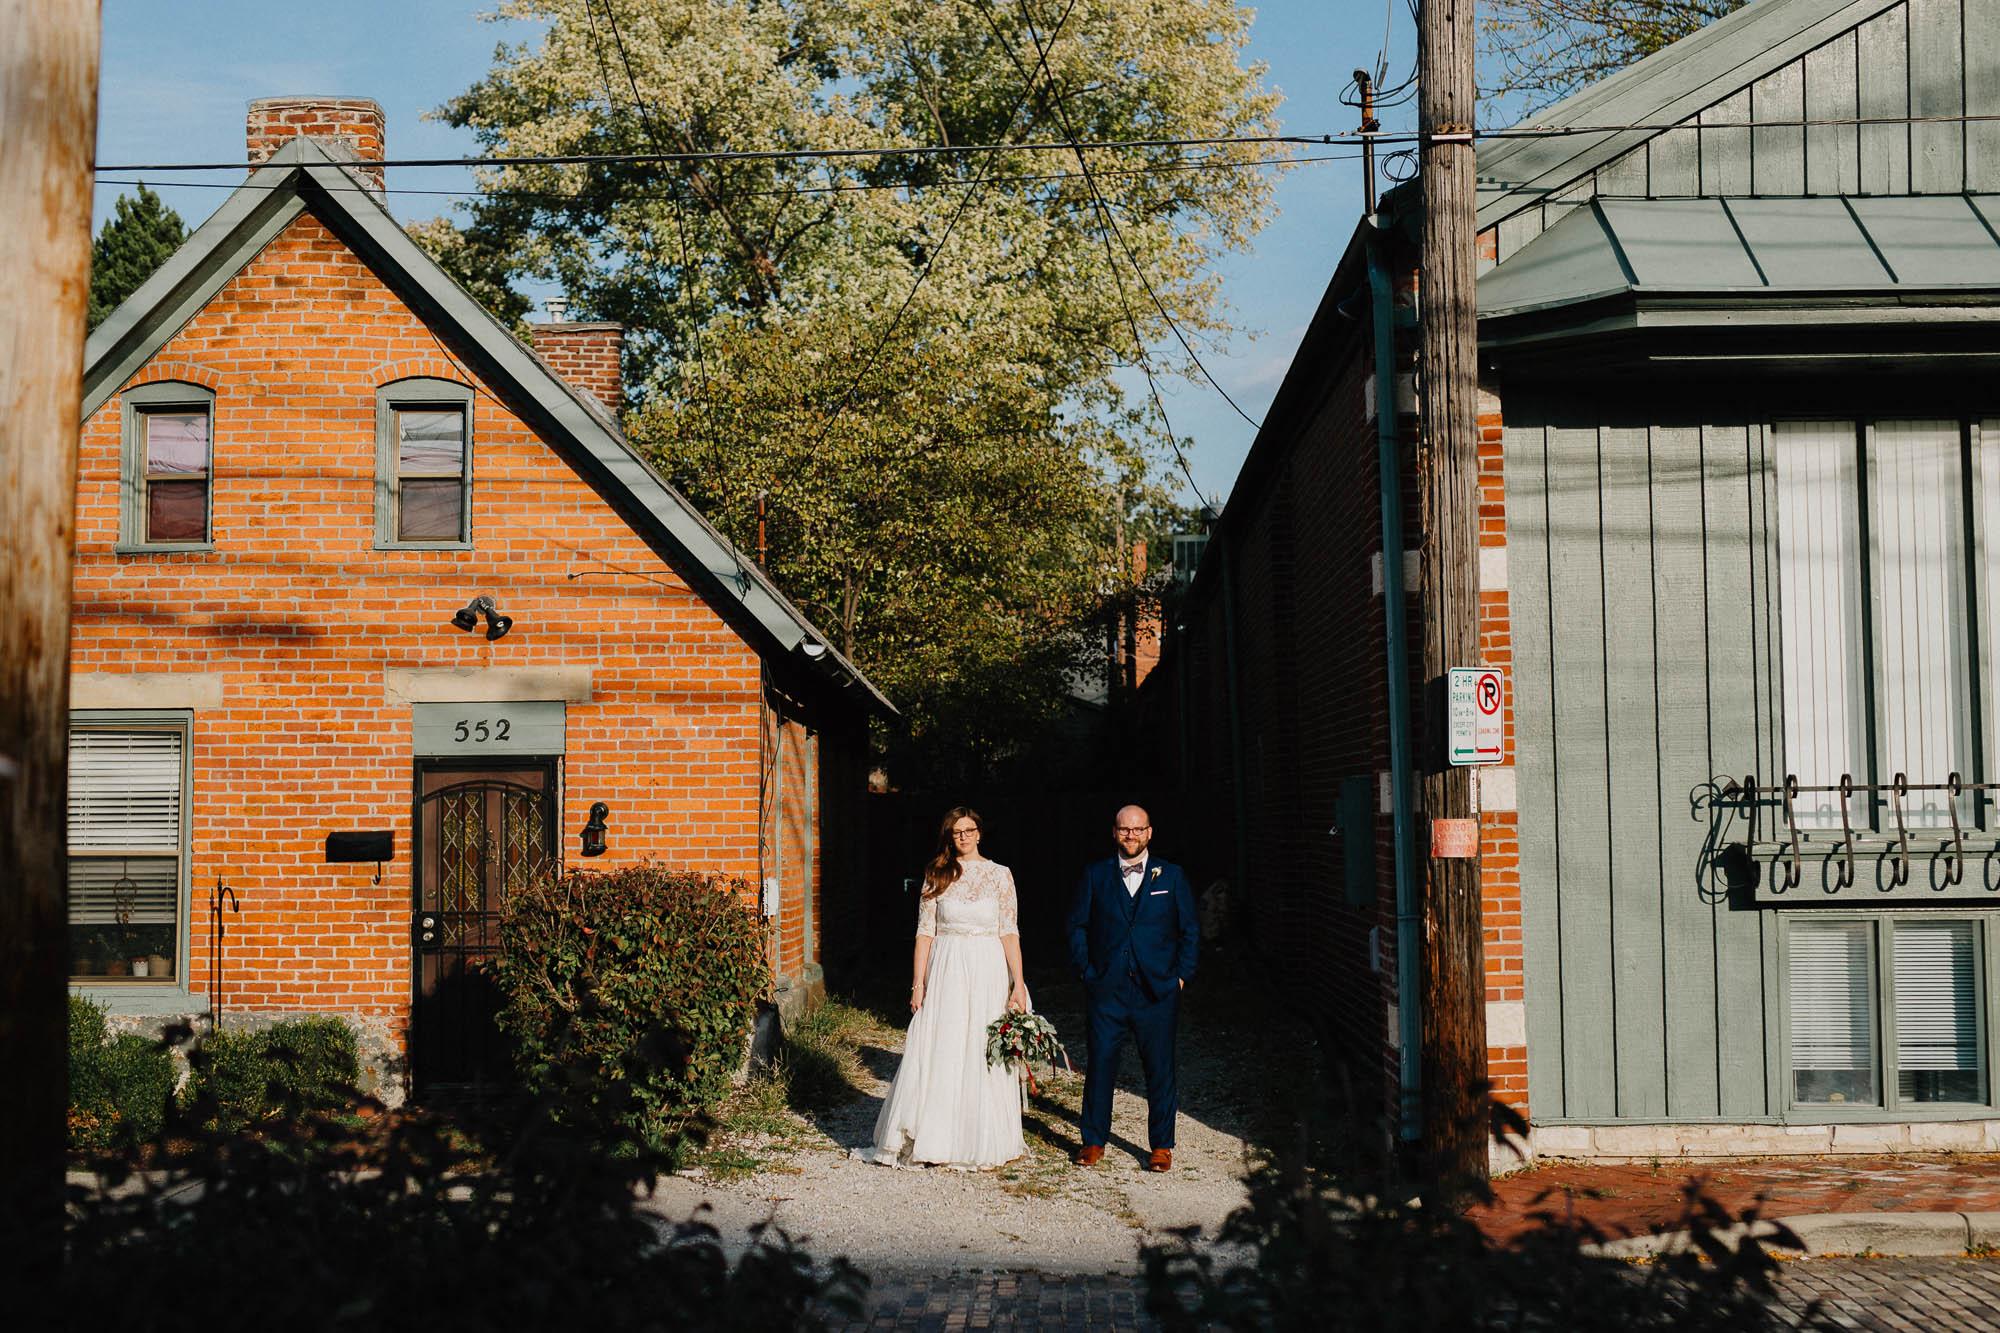 Highline-Car-House-Wedding-Columbus-Kristin-Aaron-061.jpg